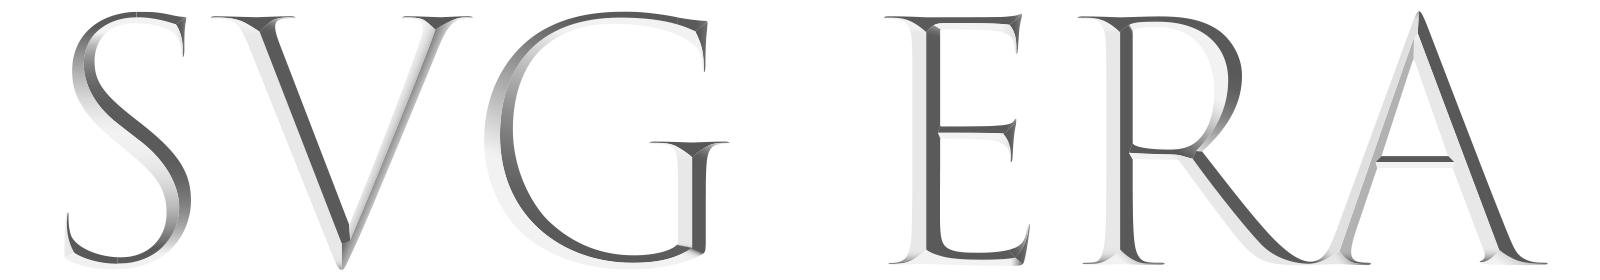 An SVG-in-OT version of Trajan.